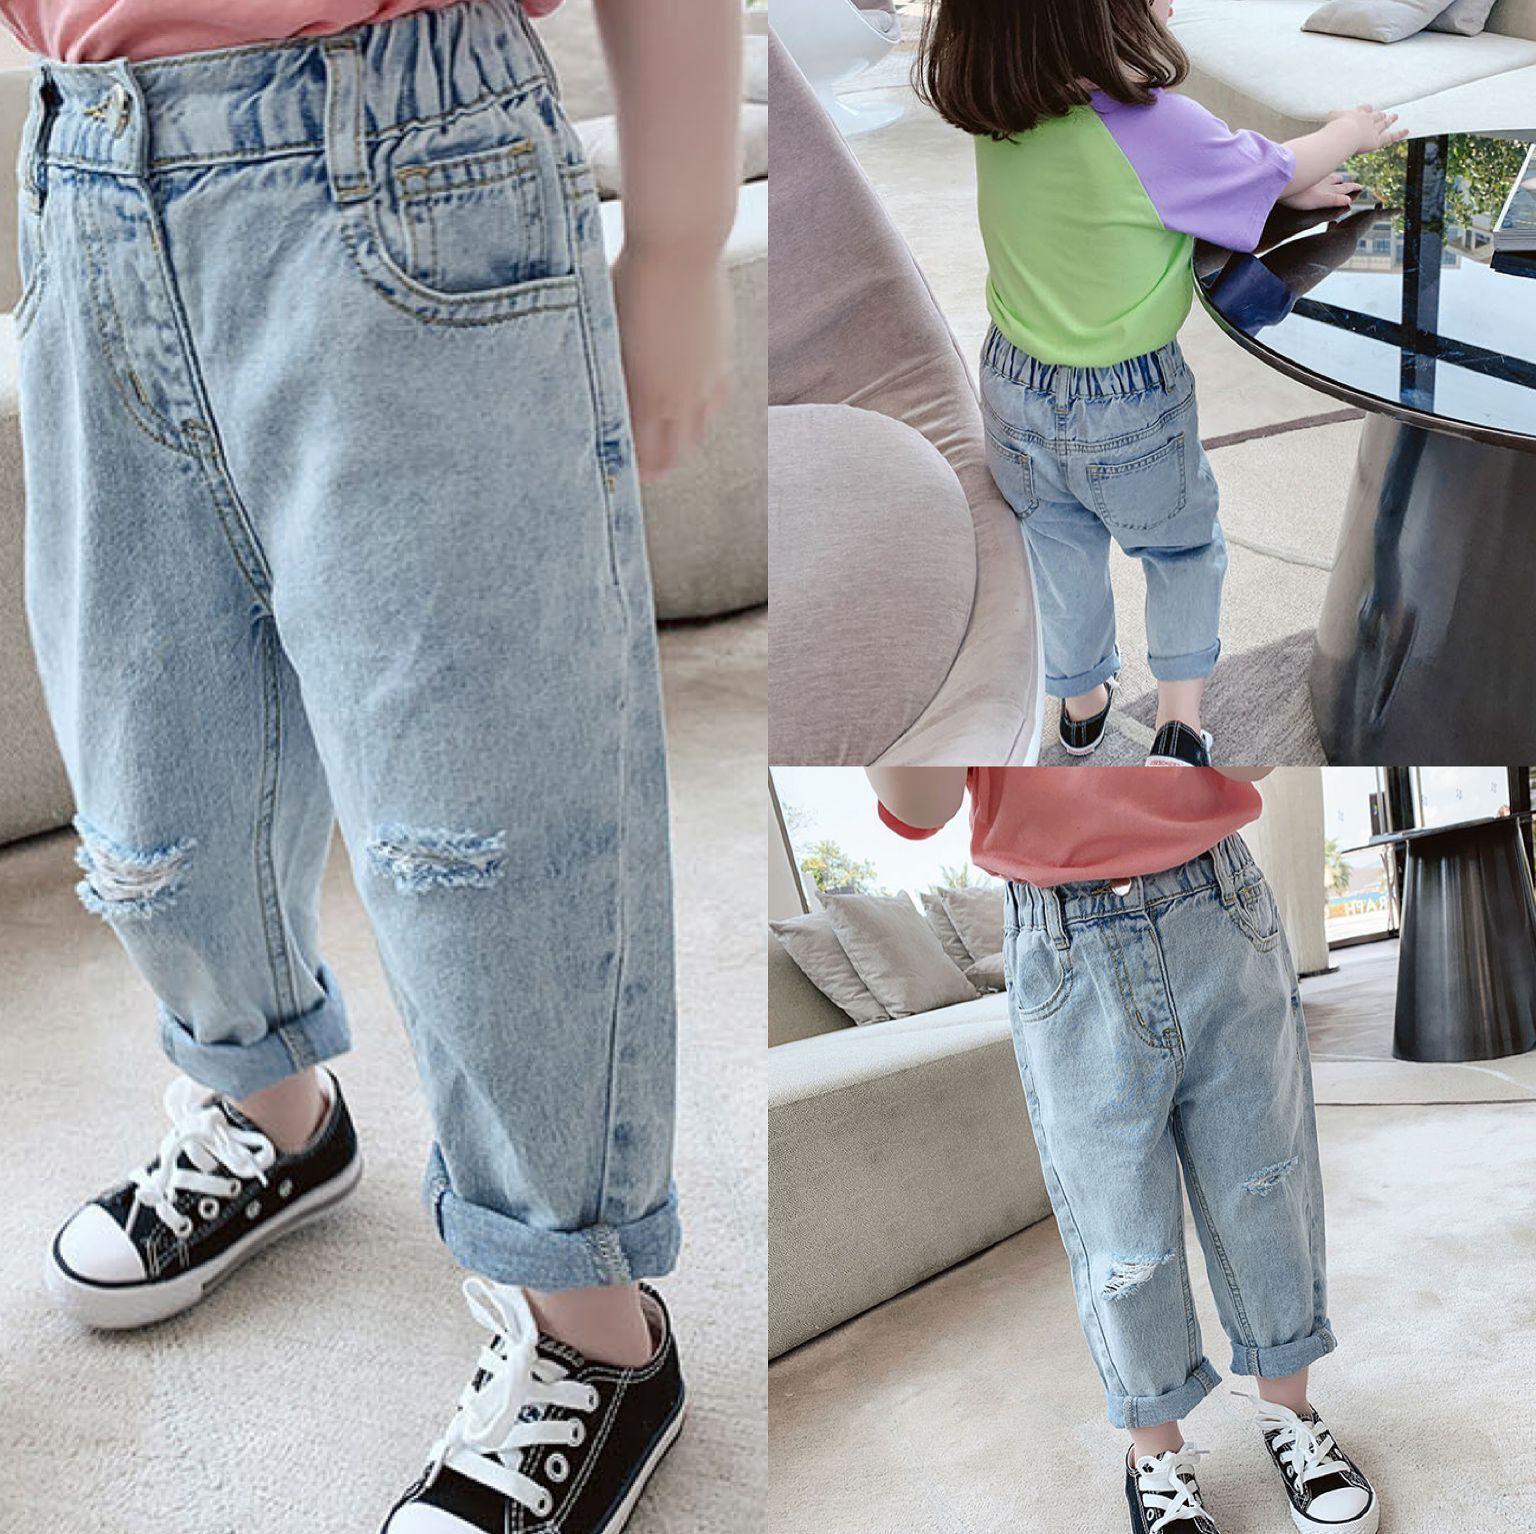 TG Korean INS Spring Summer Kids Girls Jeans Trousers Quality Elastic Waist Autumn Children Unisex Pants